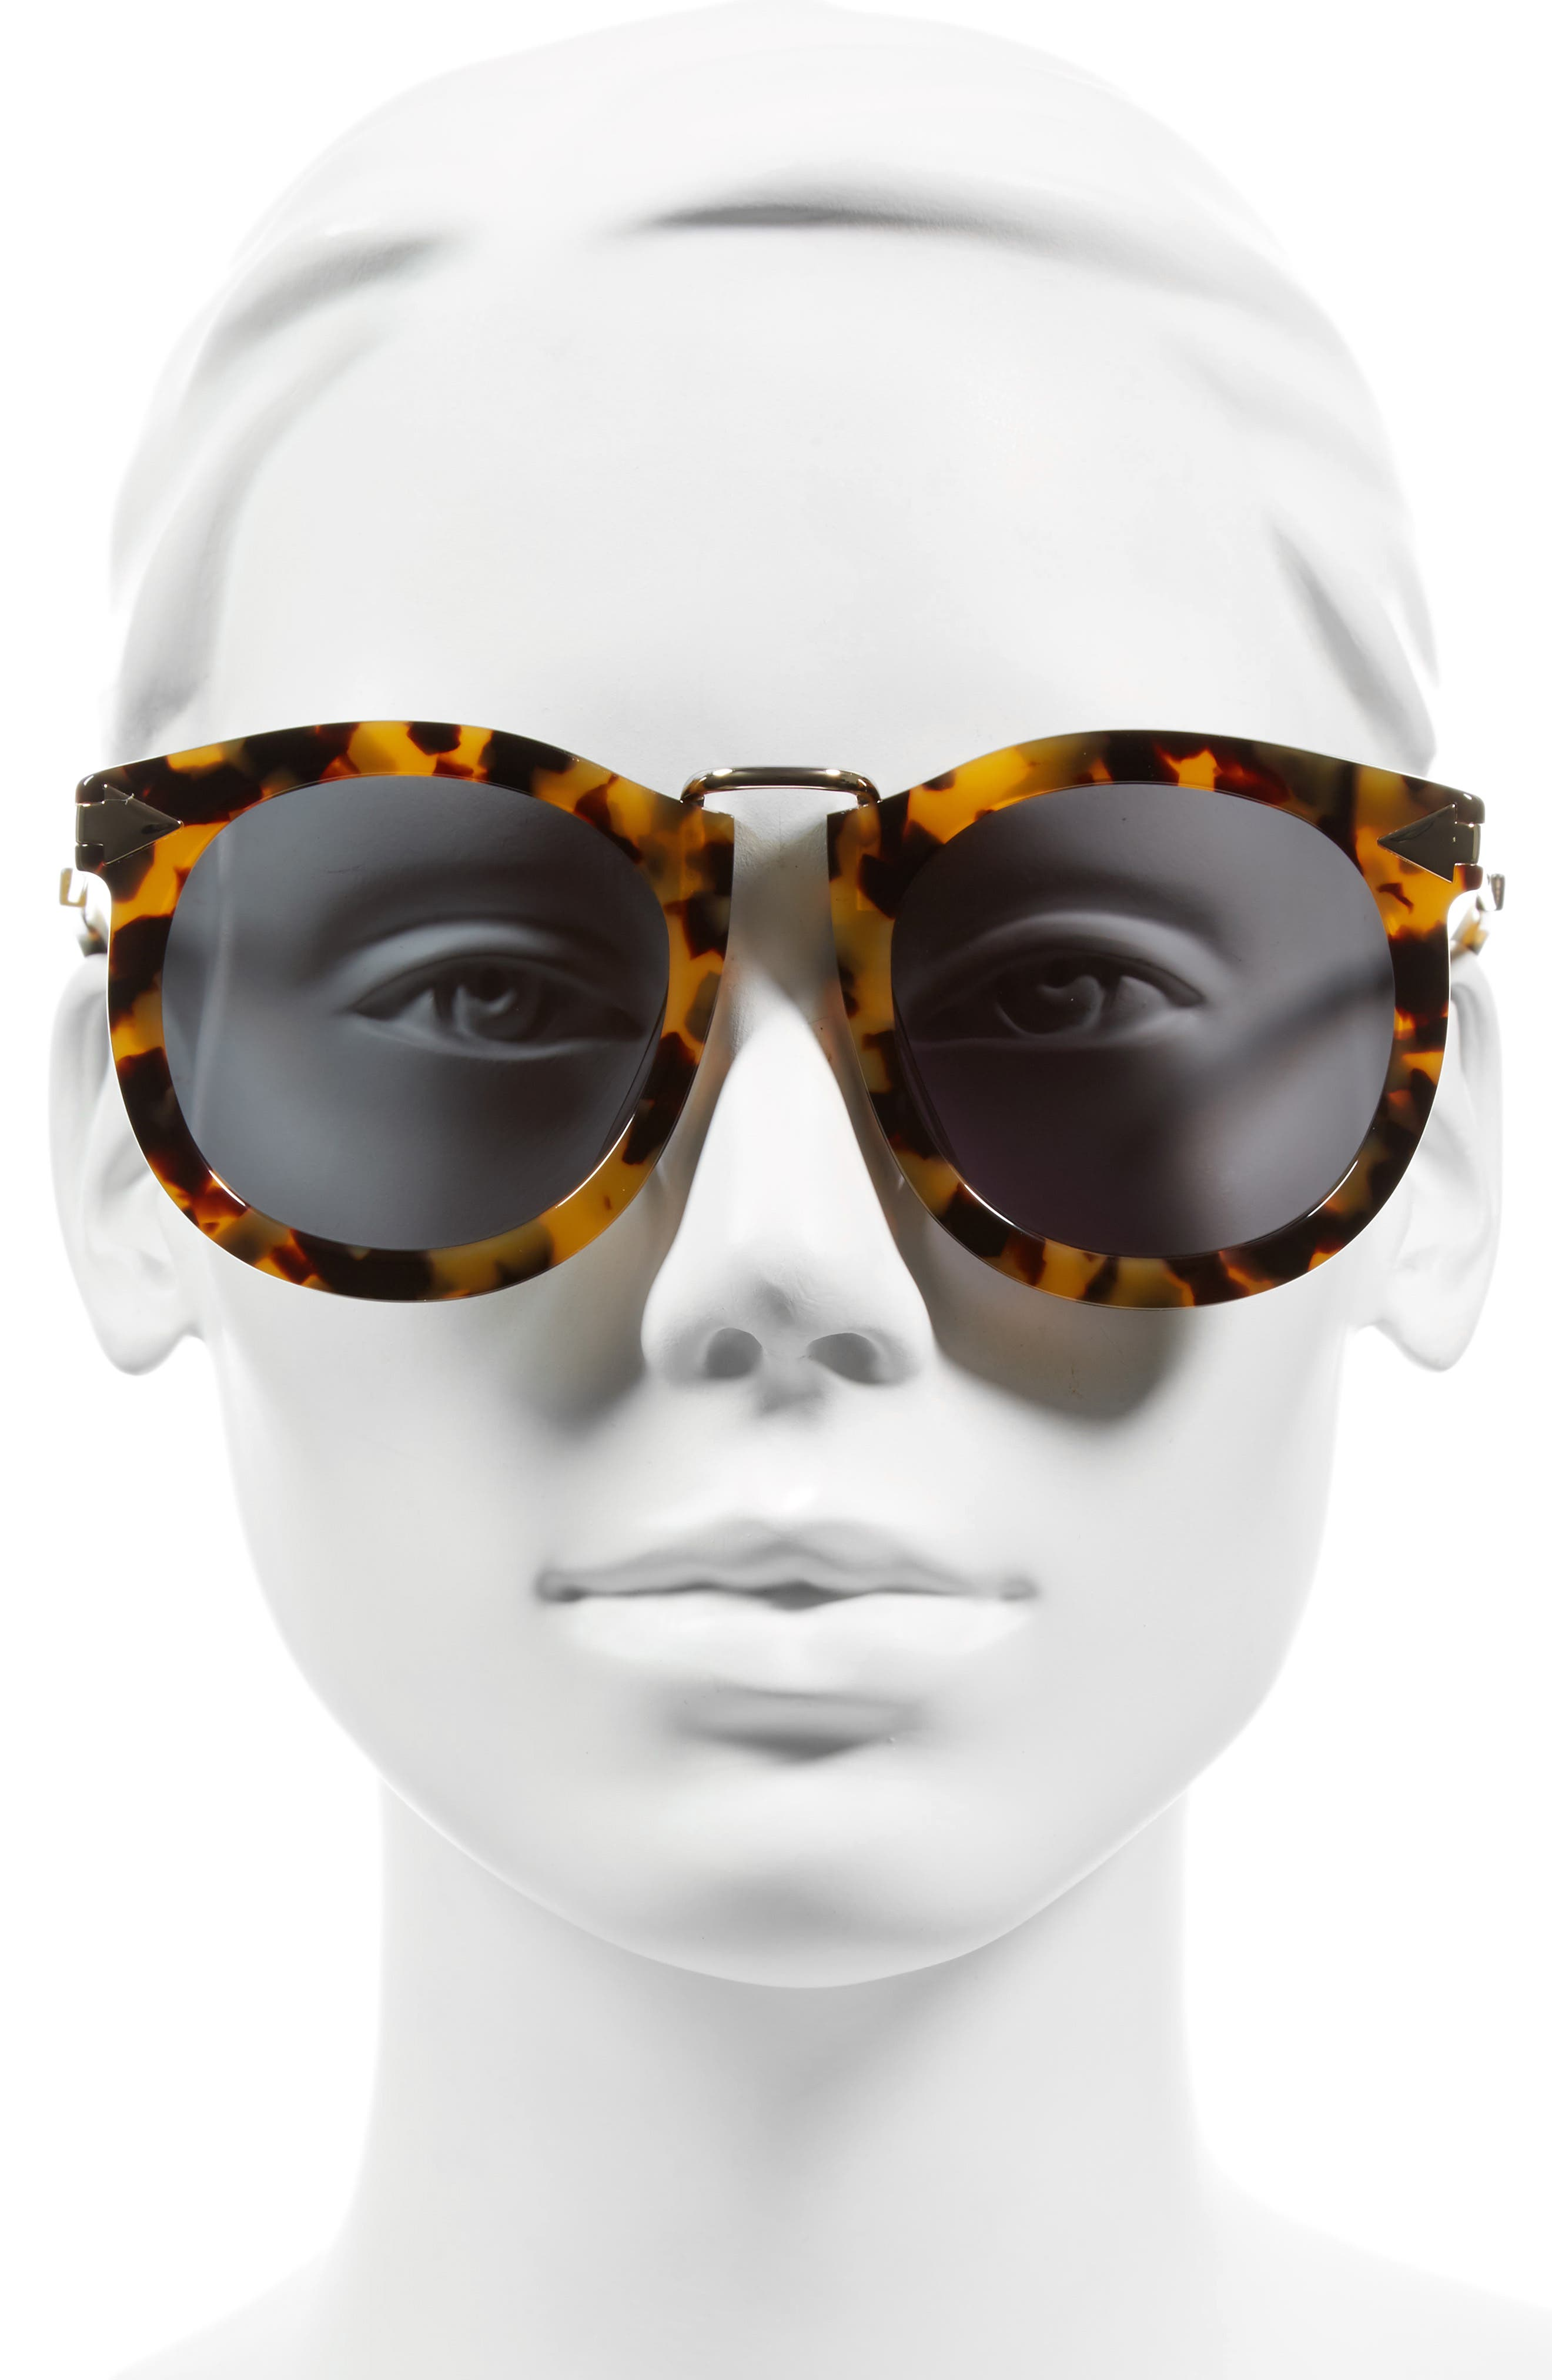 Alternative Fit Super Lunar - Arrowed by Karen 50mm Sunglasses,                             Alternate thumbnail 6, color,